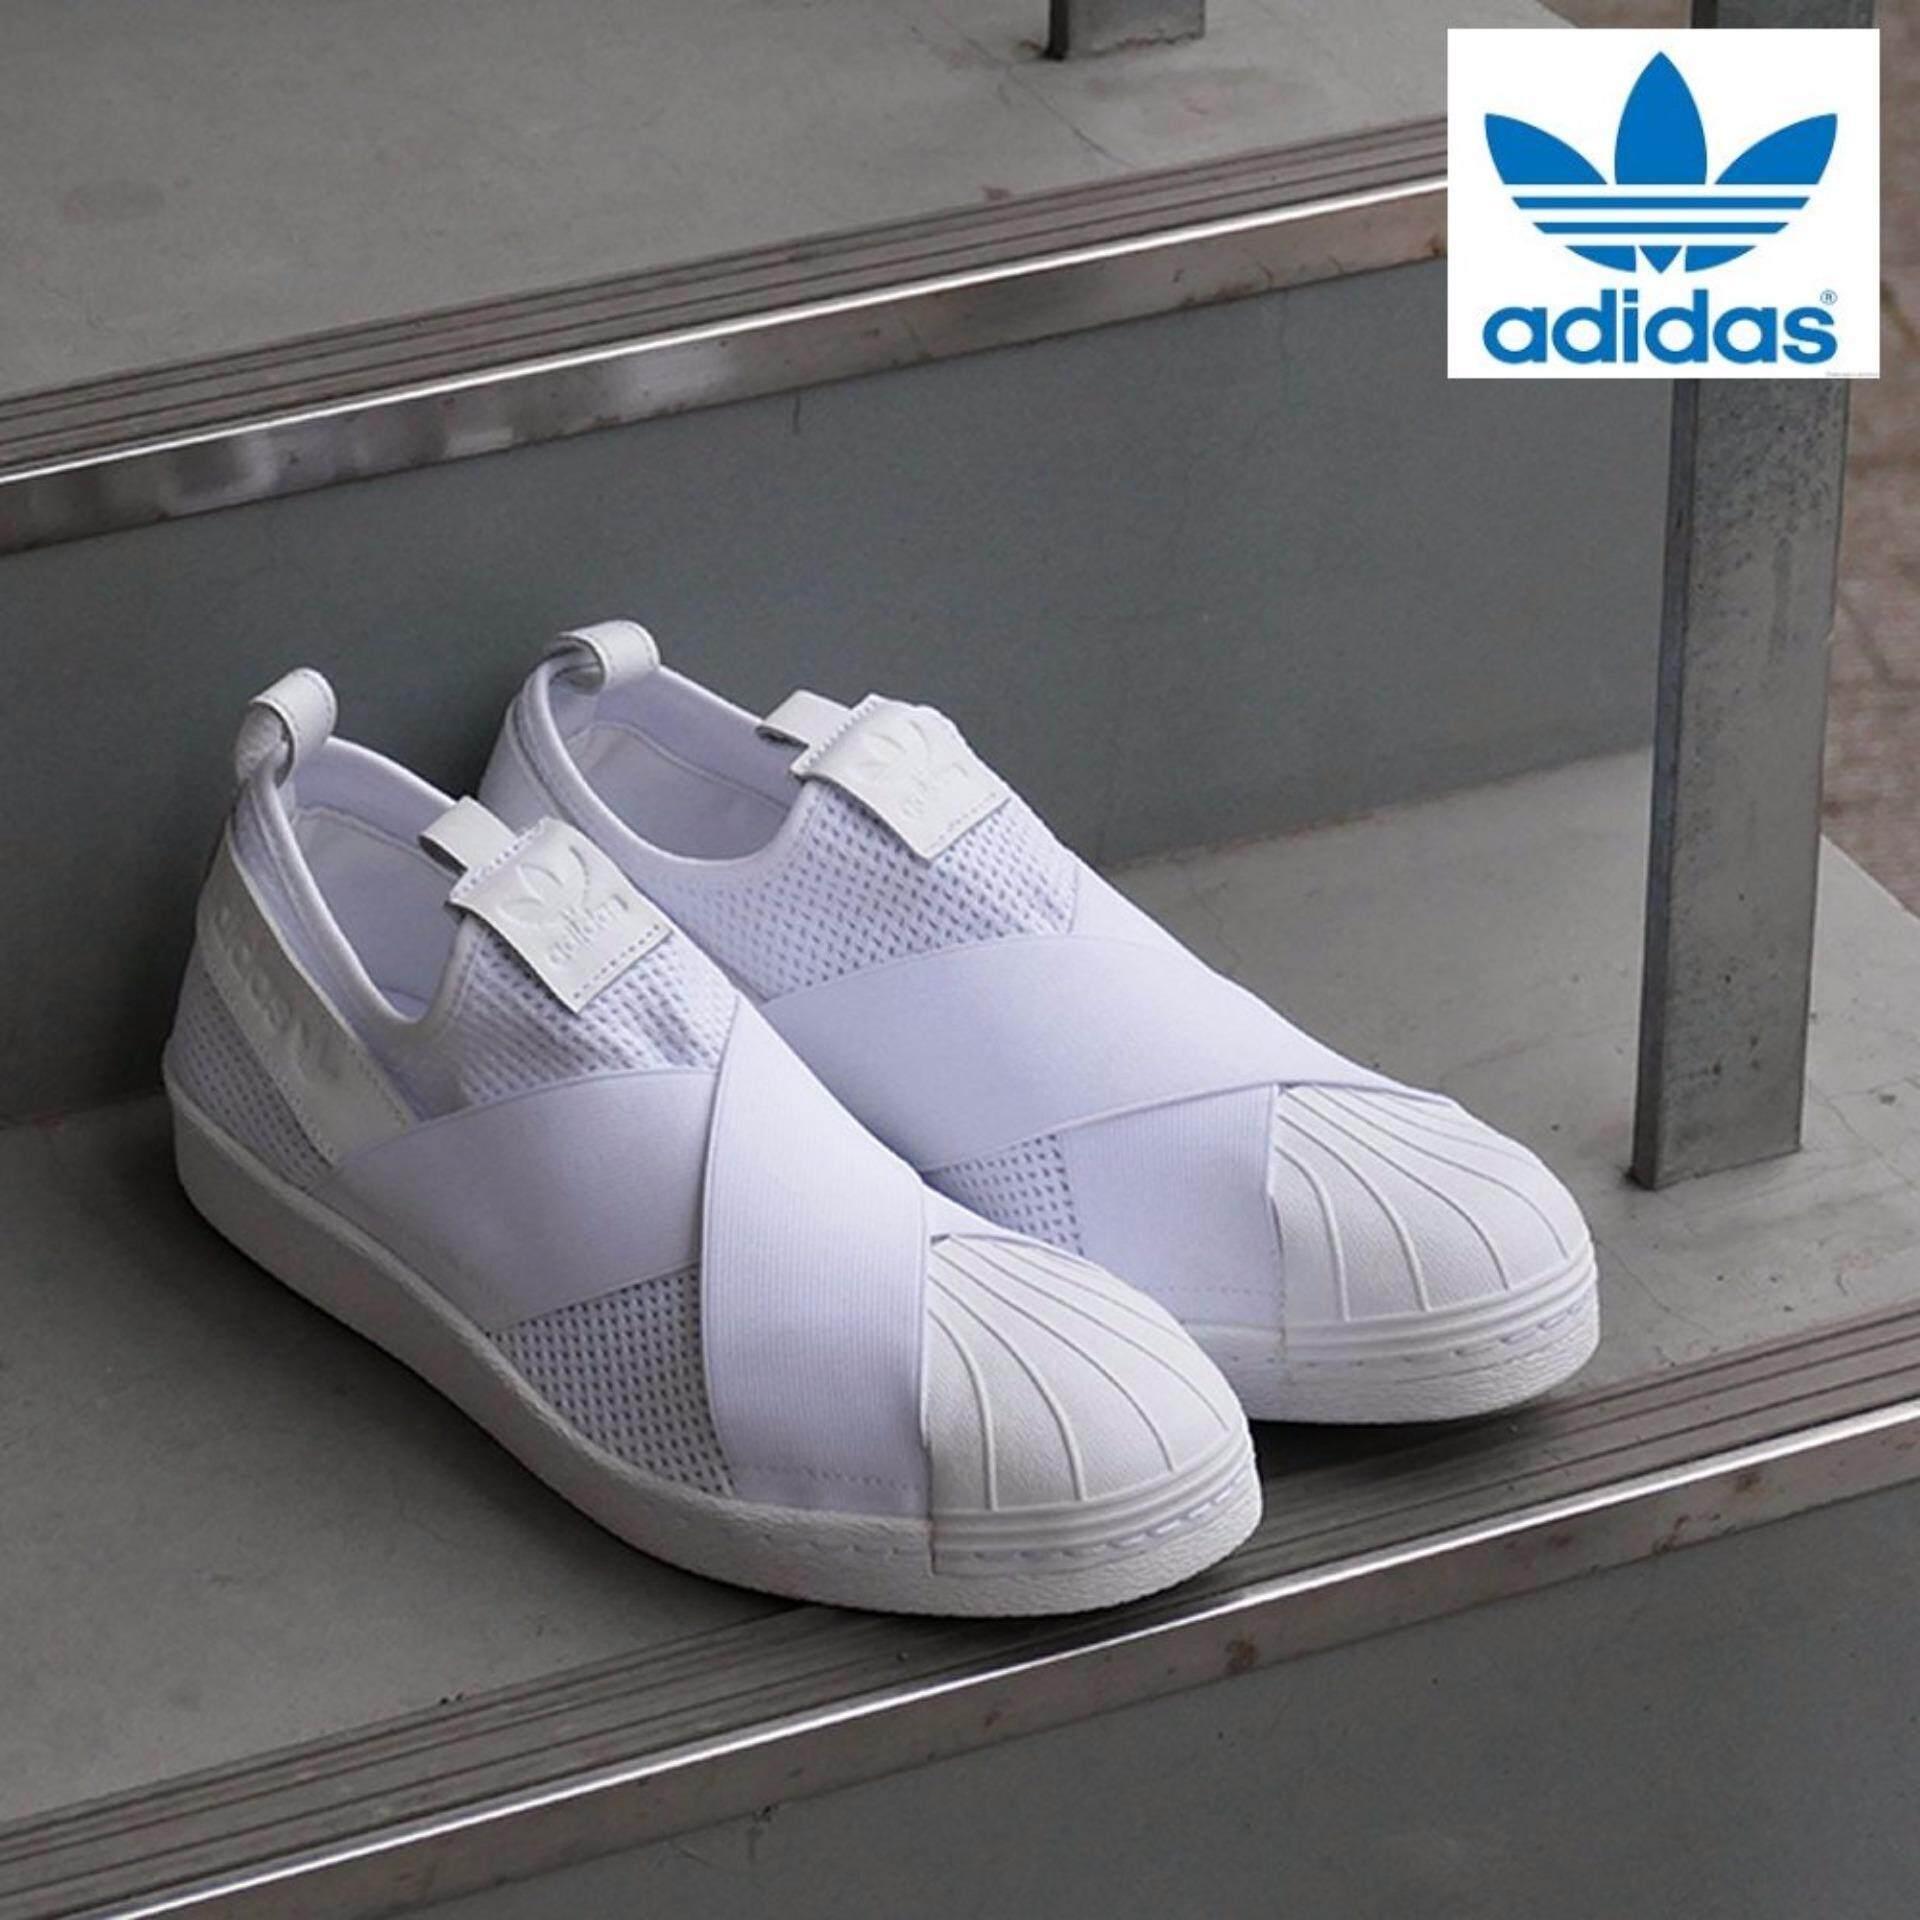 (Special SALE) Adidas New Originals Superstar Slip on (WhiteWhite) BY2885 Shoes 100% Original